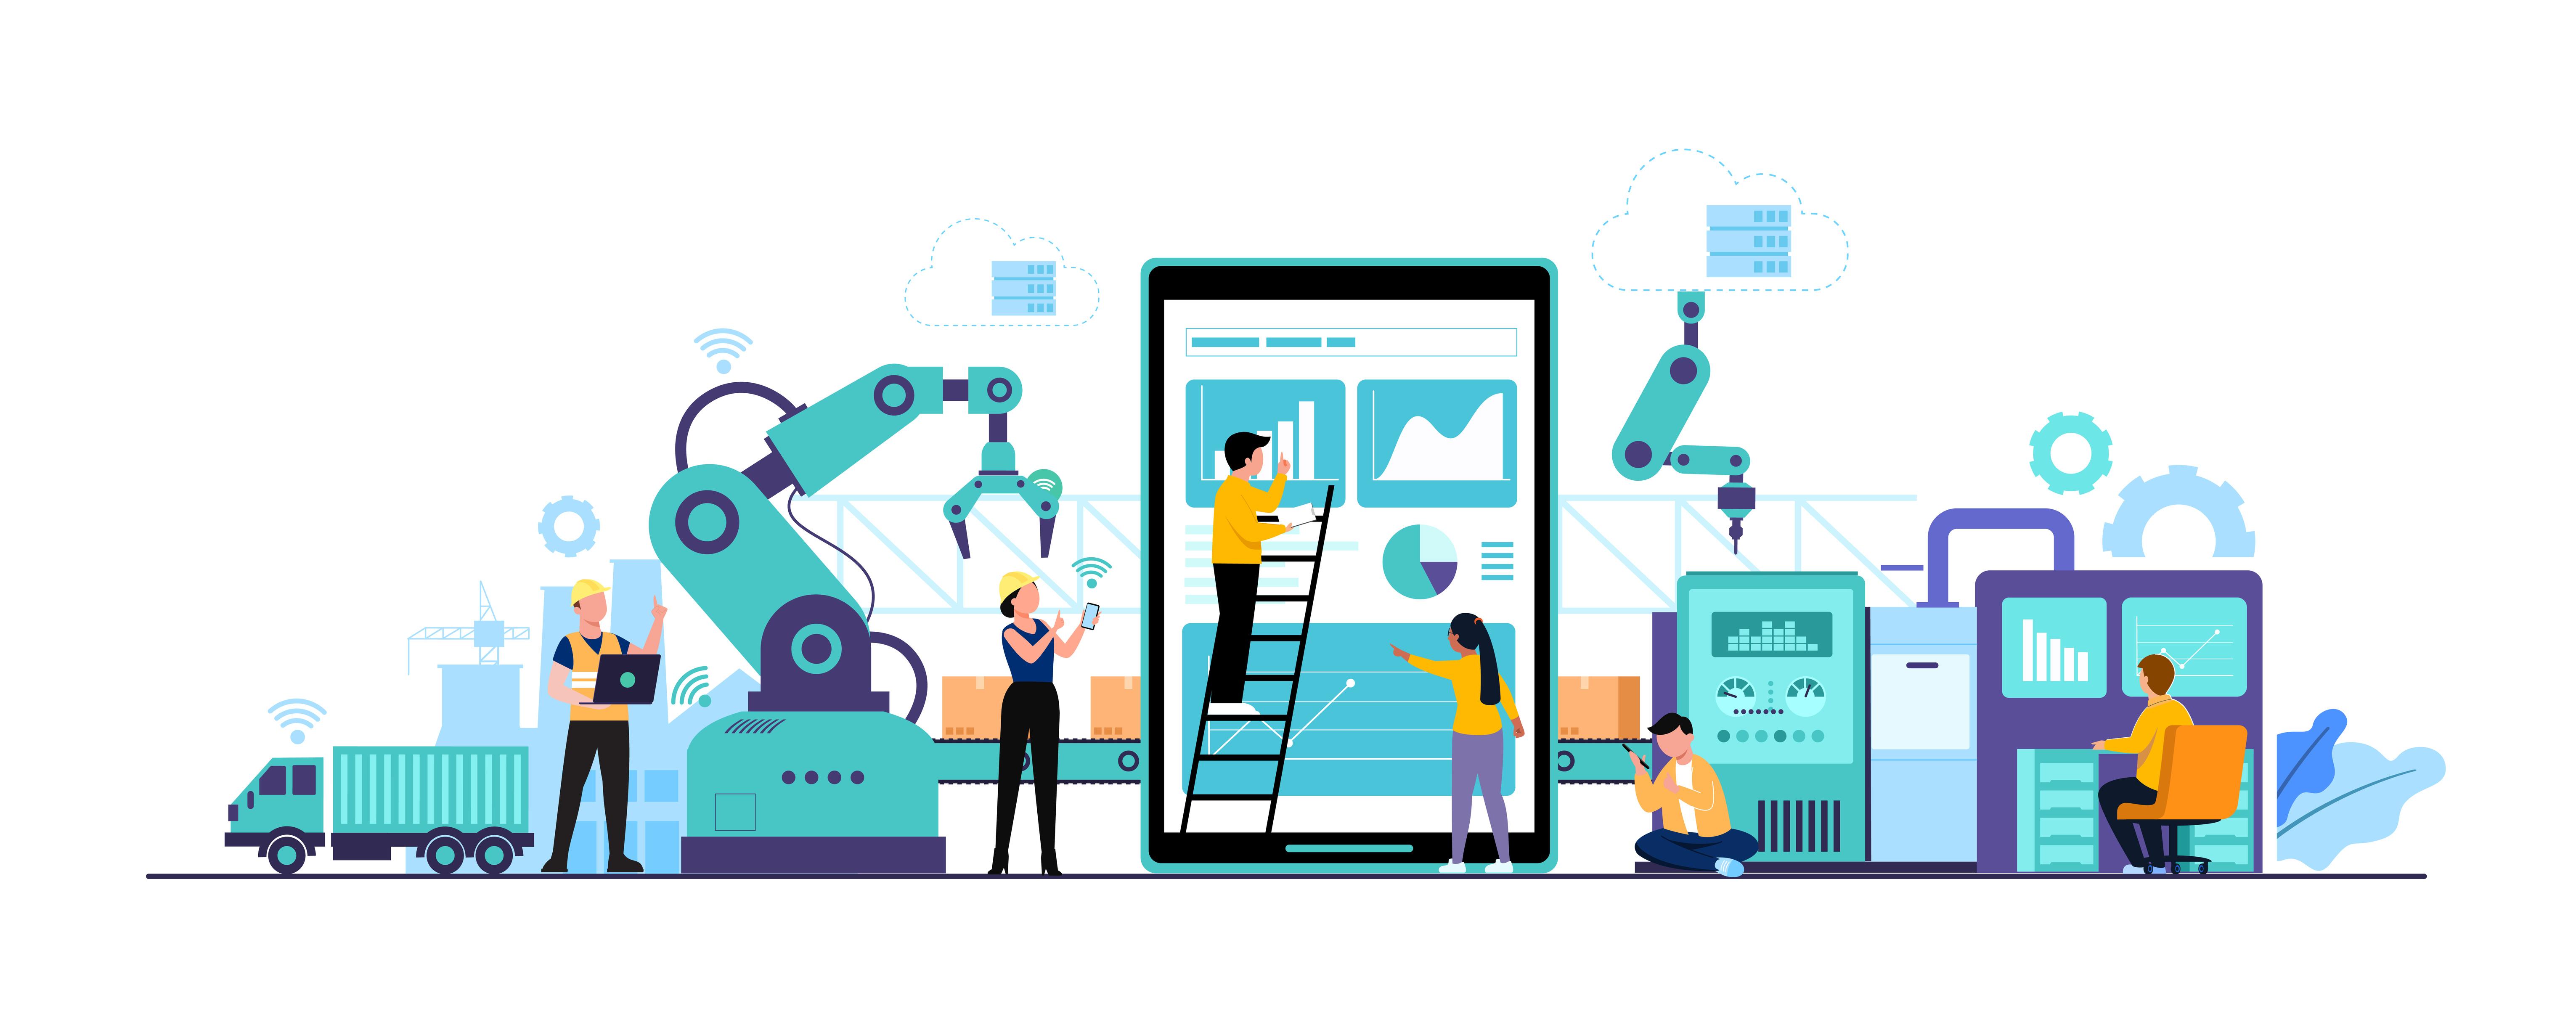 Microsoft Teams - Collaboration made easier